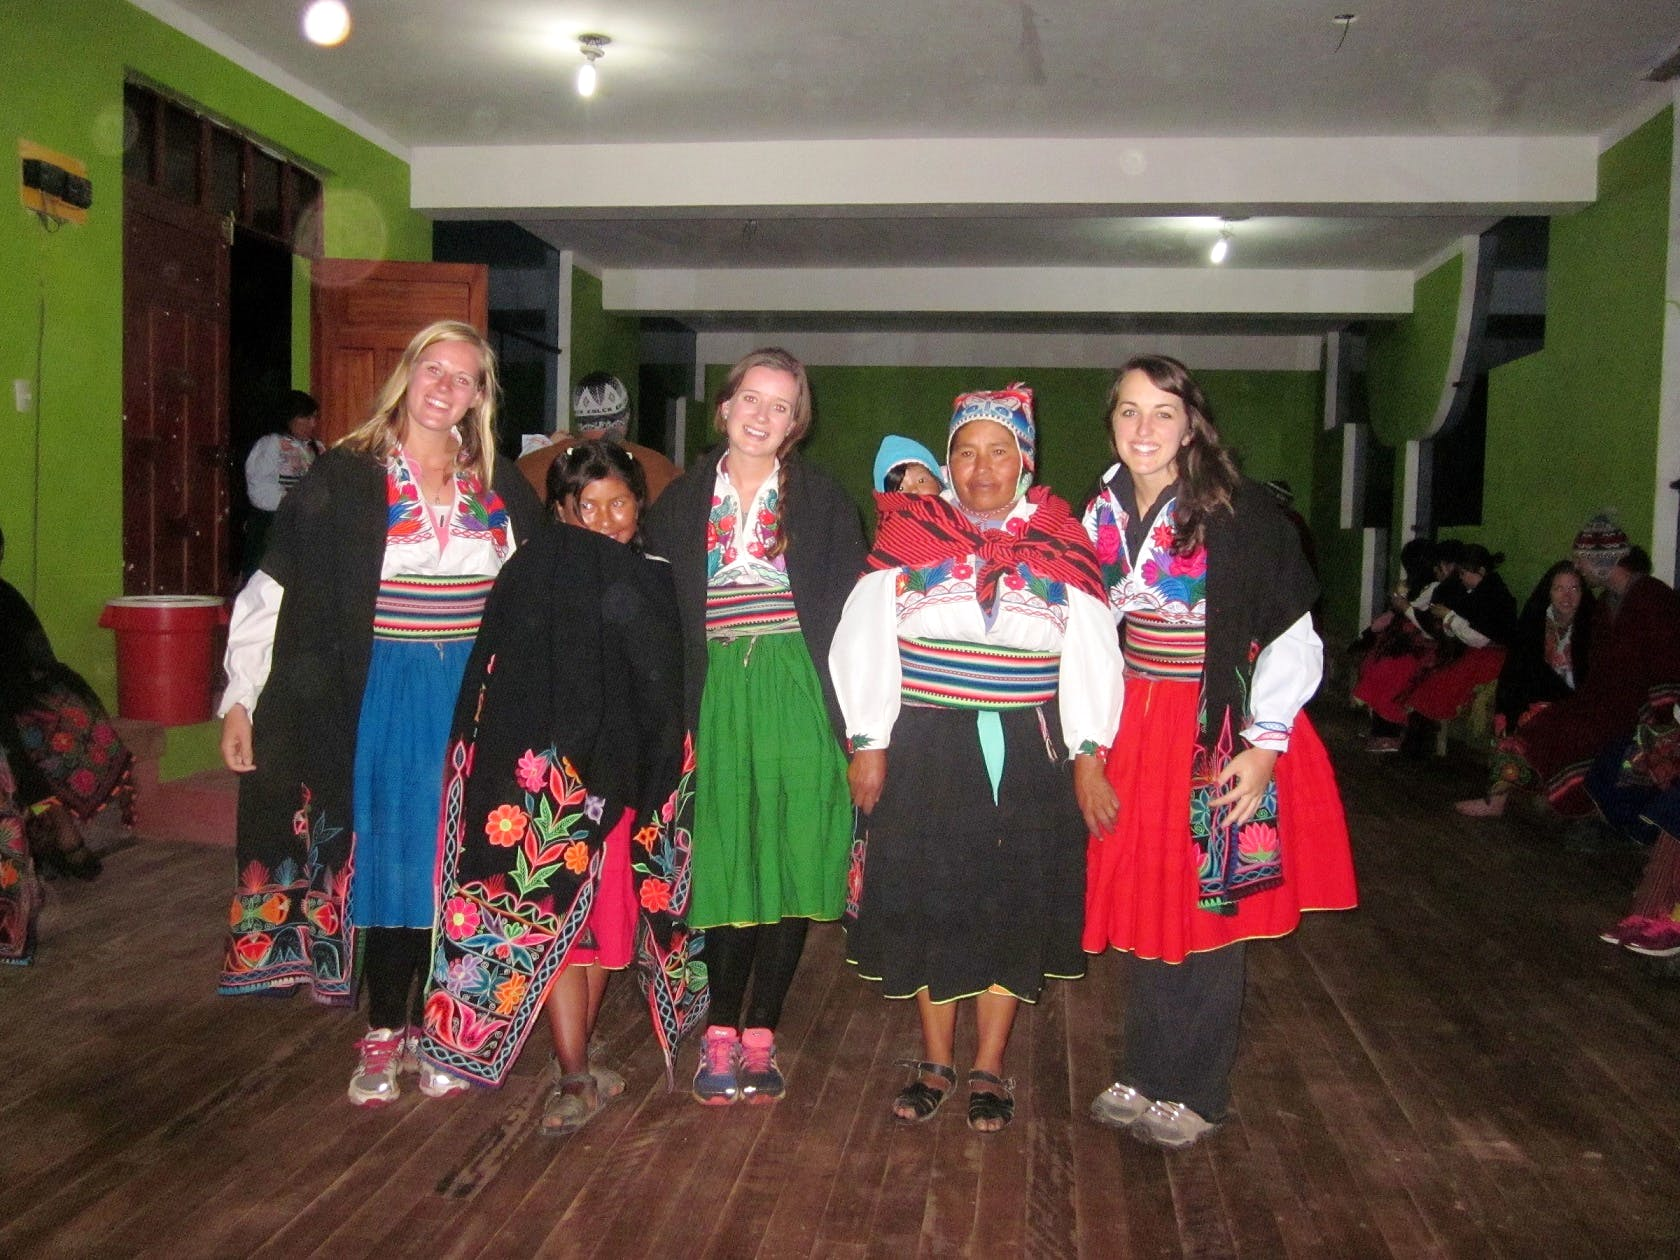 Support Local Women's Empowerment